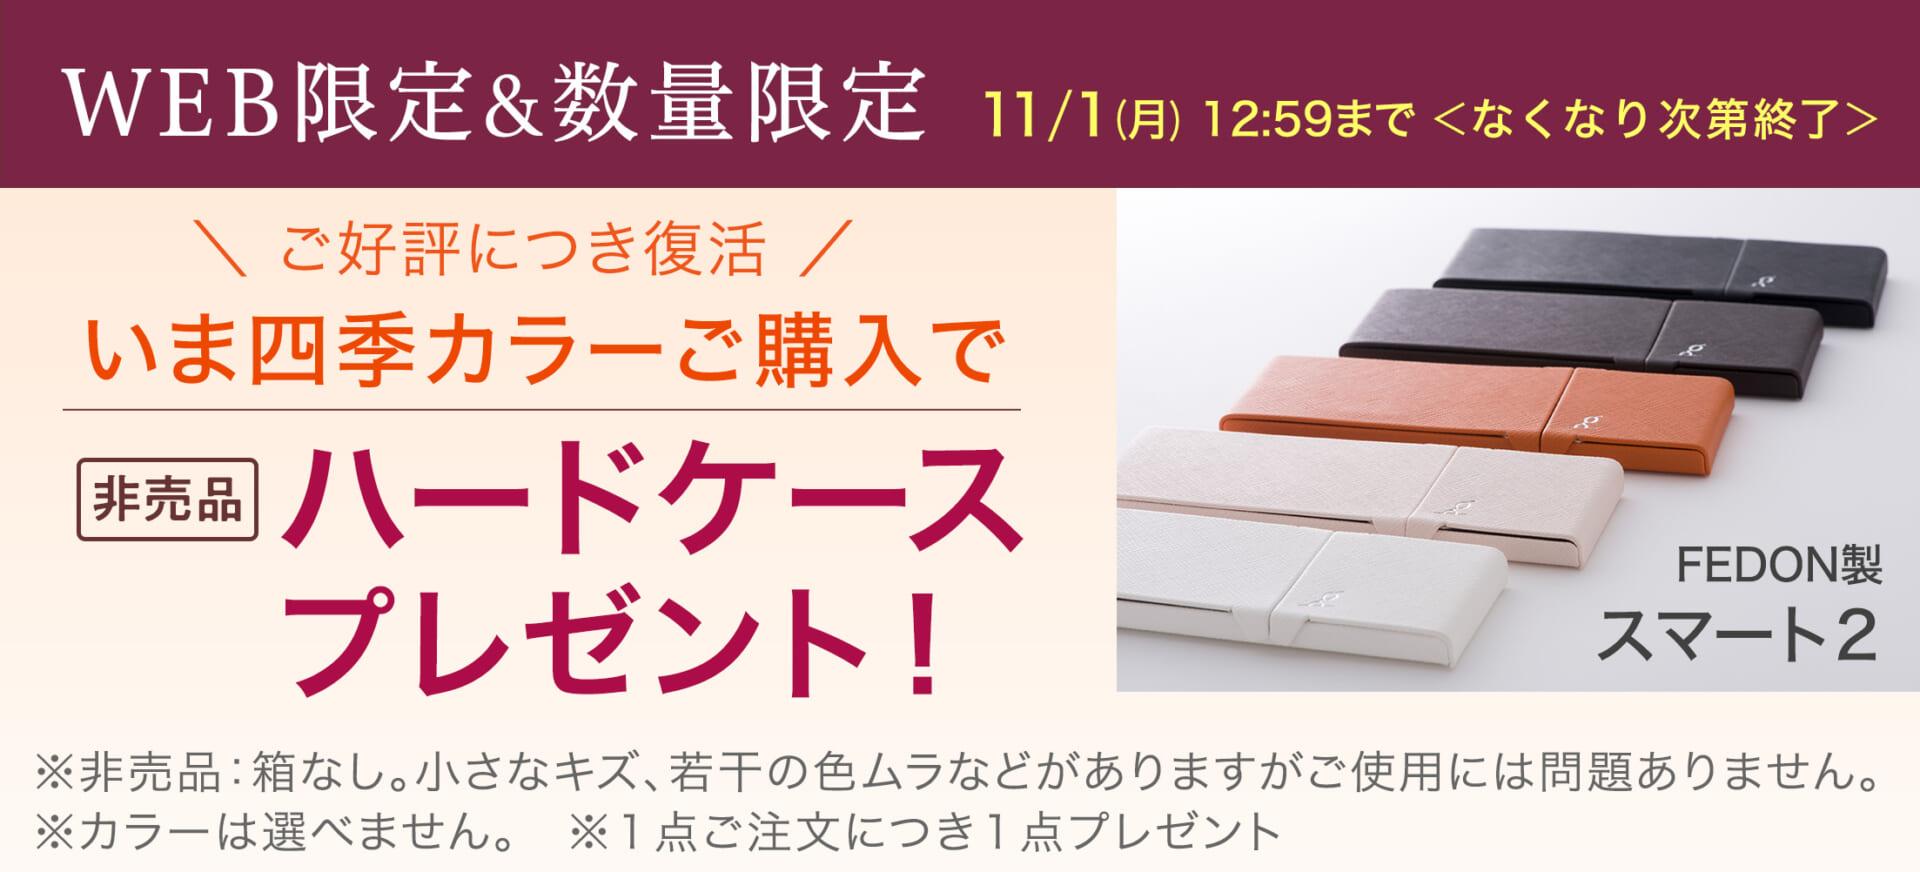 【WEB限定】四季カラー購入 ハードケース プレゼント